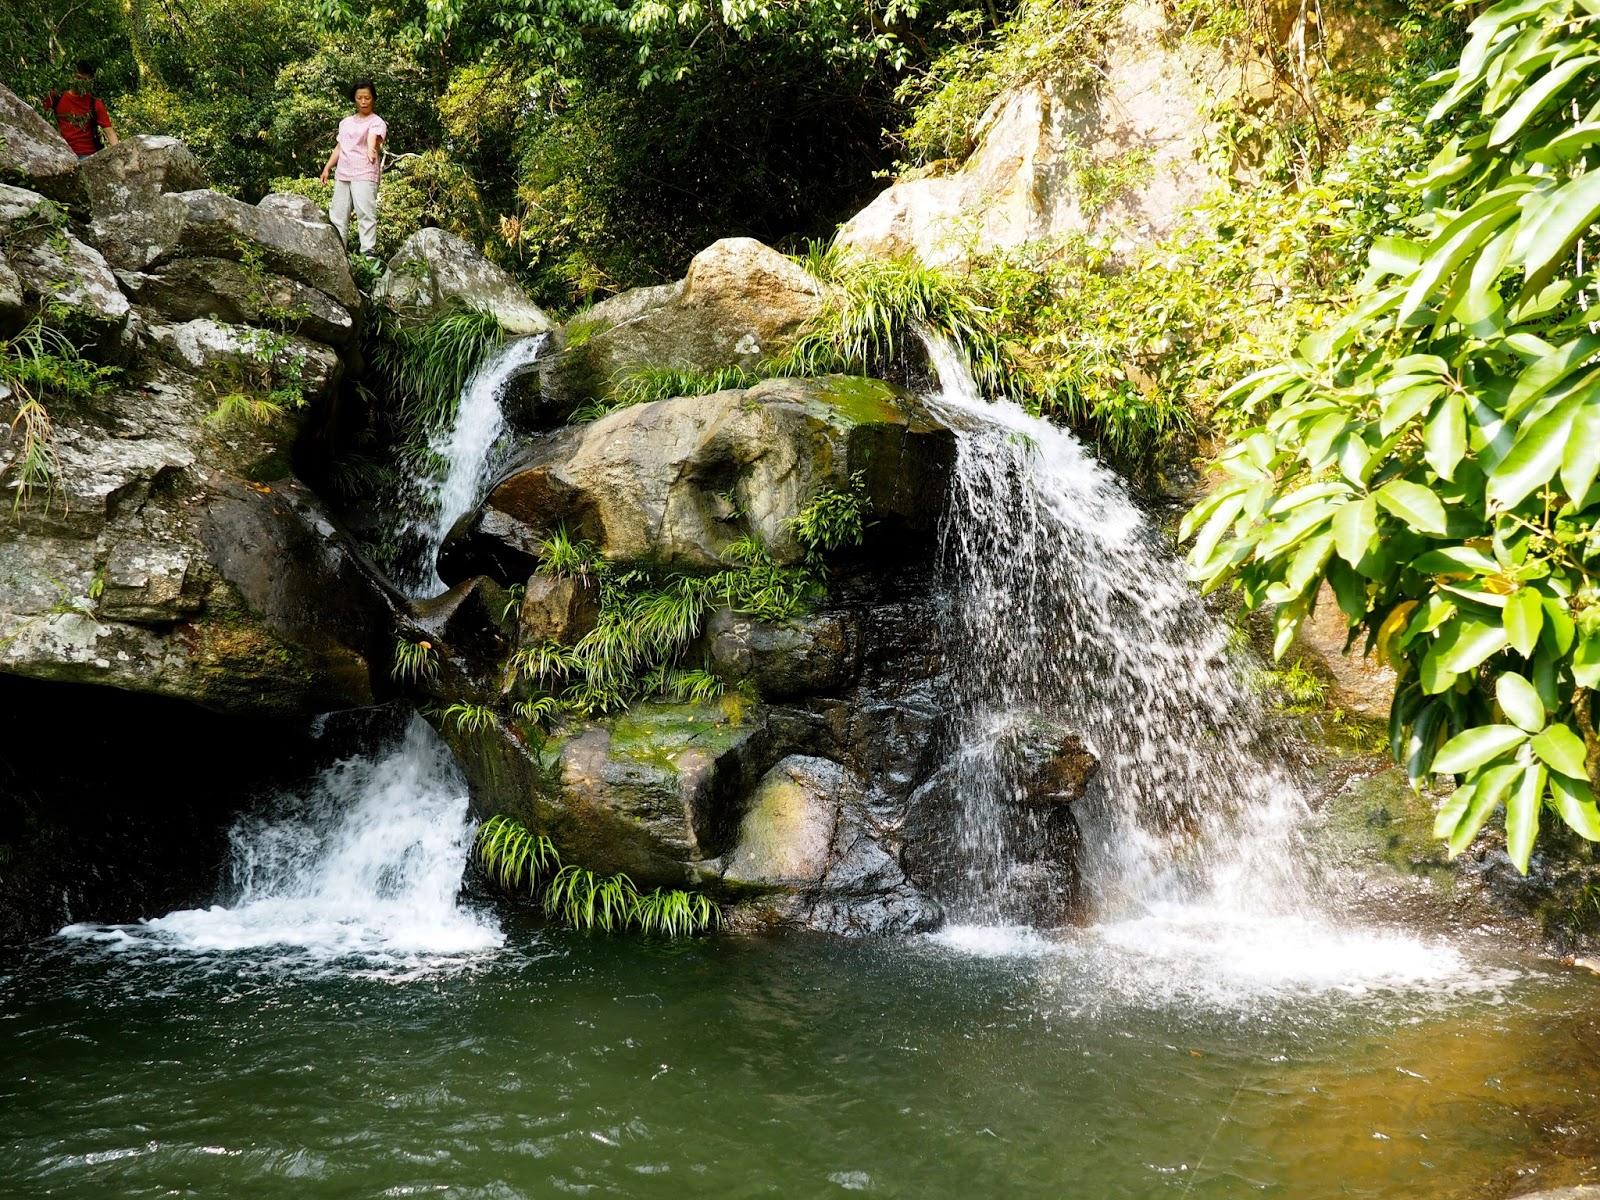 Paradise Cove Swimming Hole | Swimming holes, Paradise ... |Small Cove Waterfall